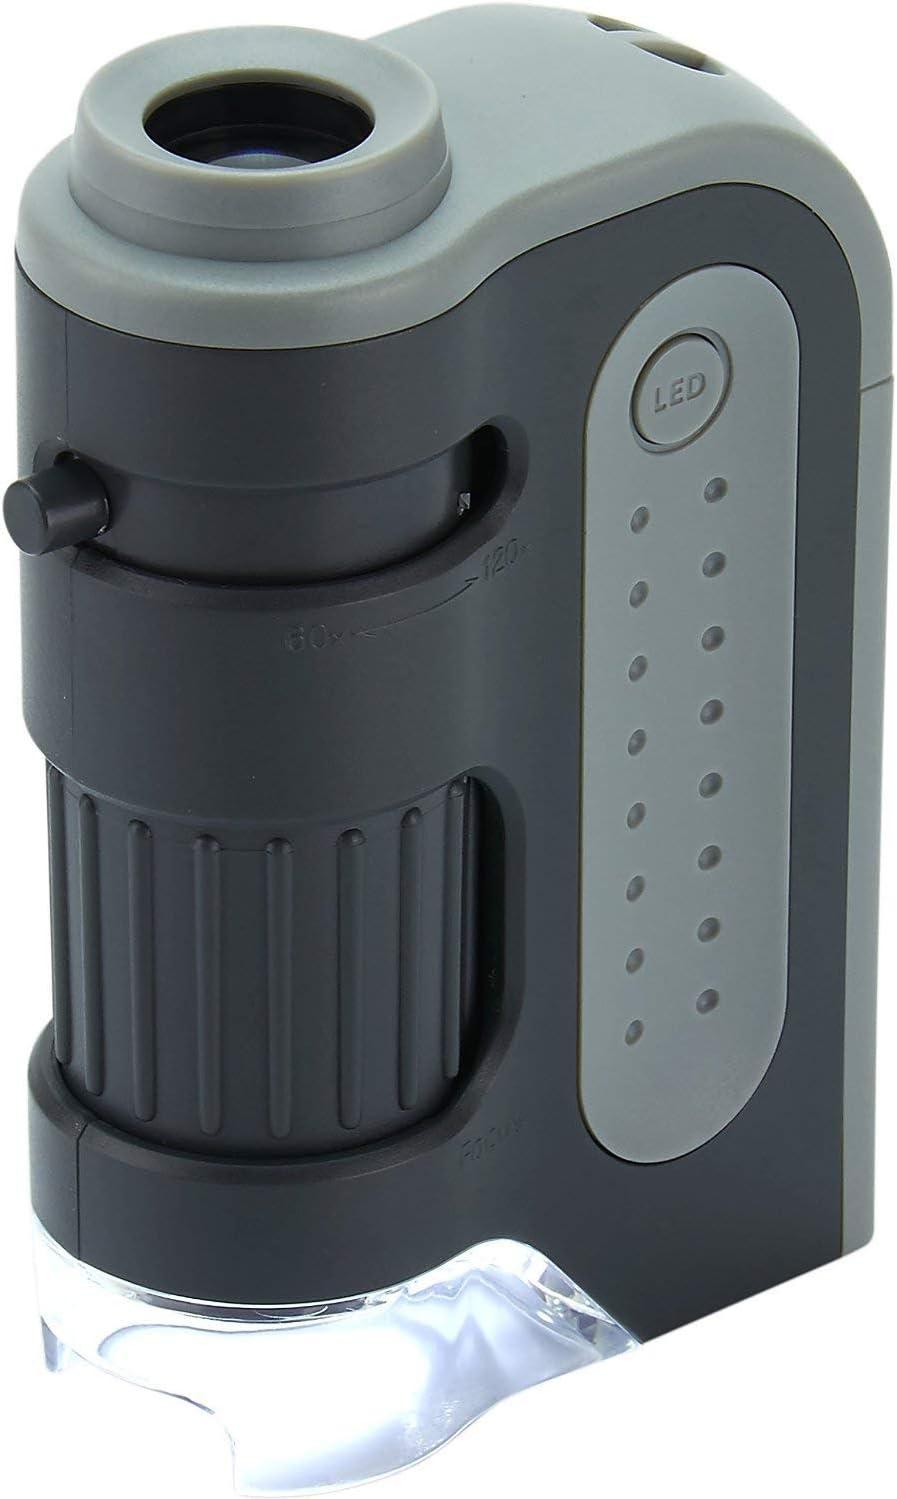 Carson MicroBrite Plus 60x-120x LED Lighted Pocket Microscope : Camera & Photo